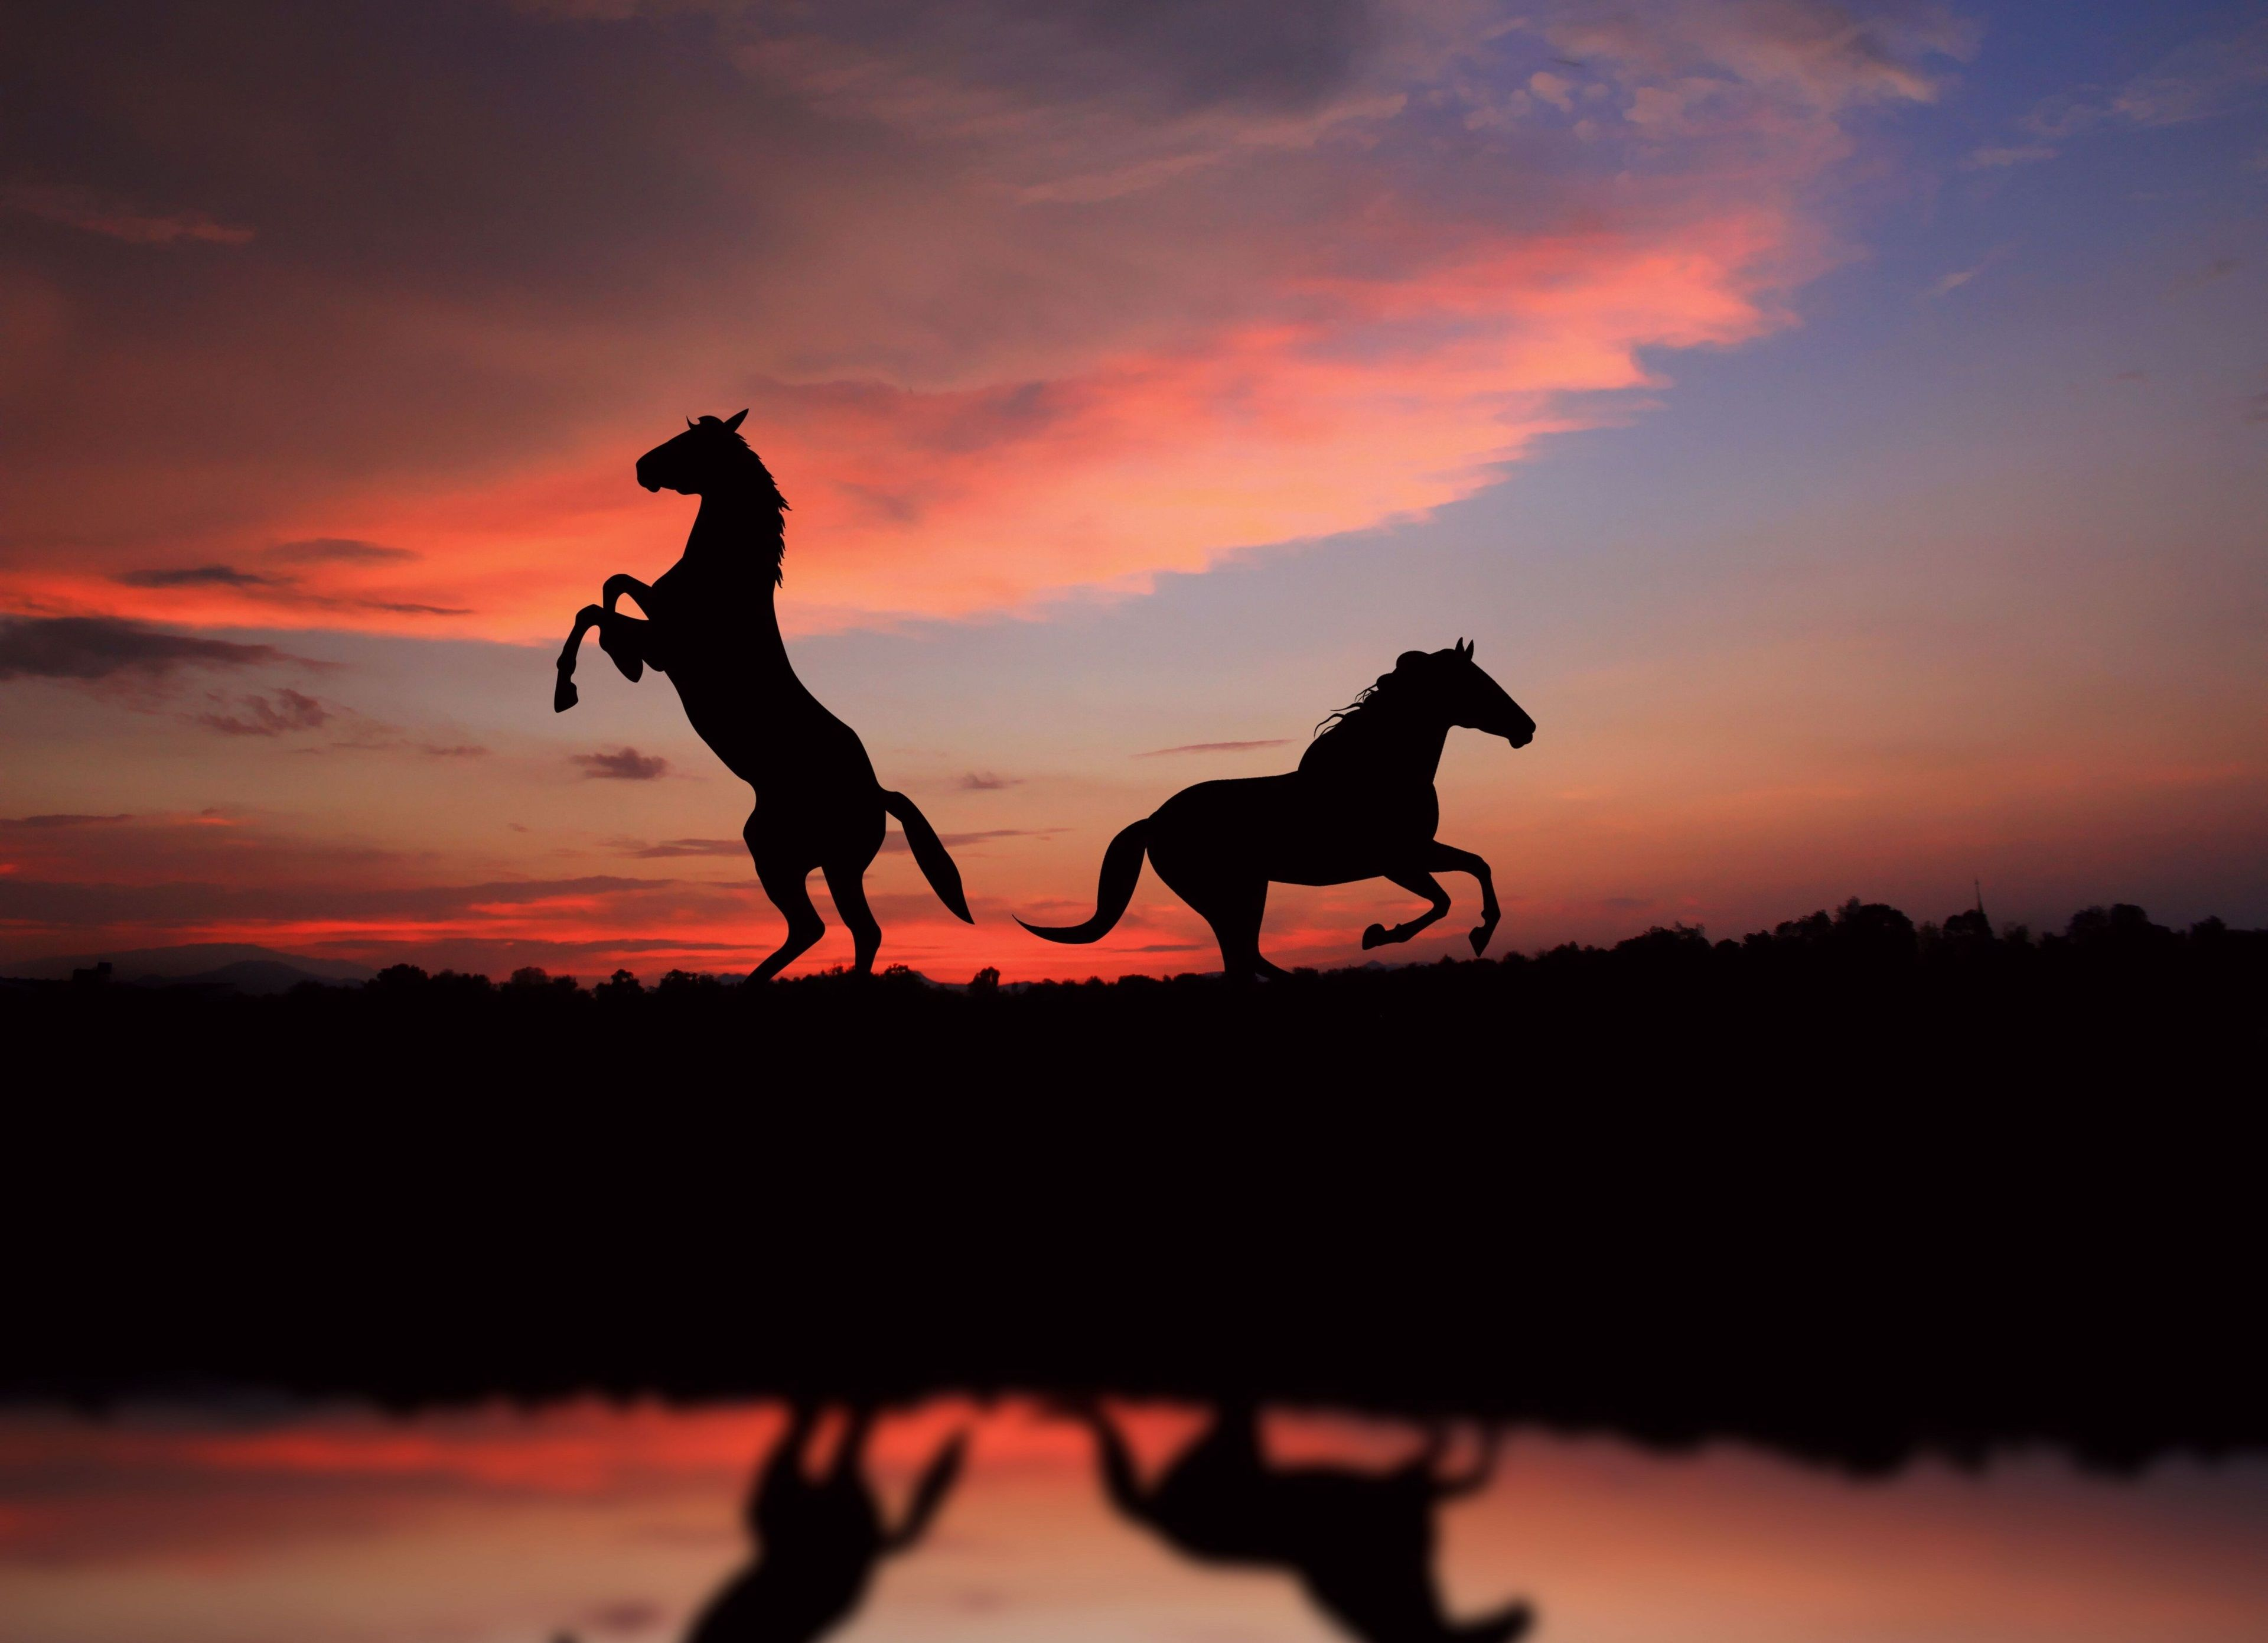 3840x2781 Horse 4k Pc Wallpaper Download Horse Wallpaper Horses Horse Silhouette